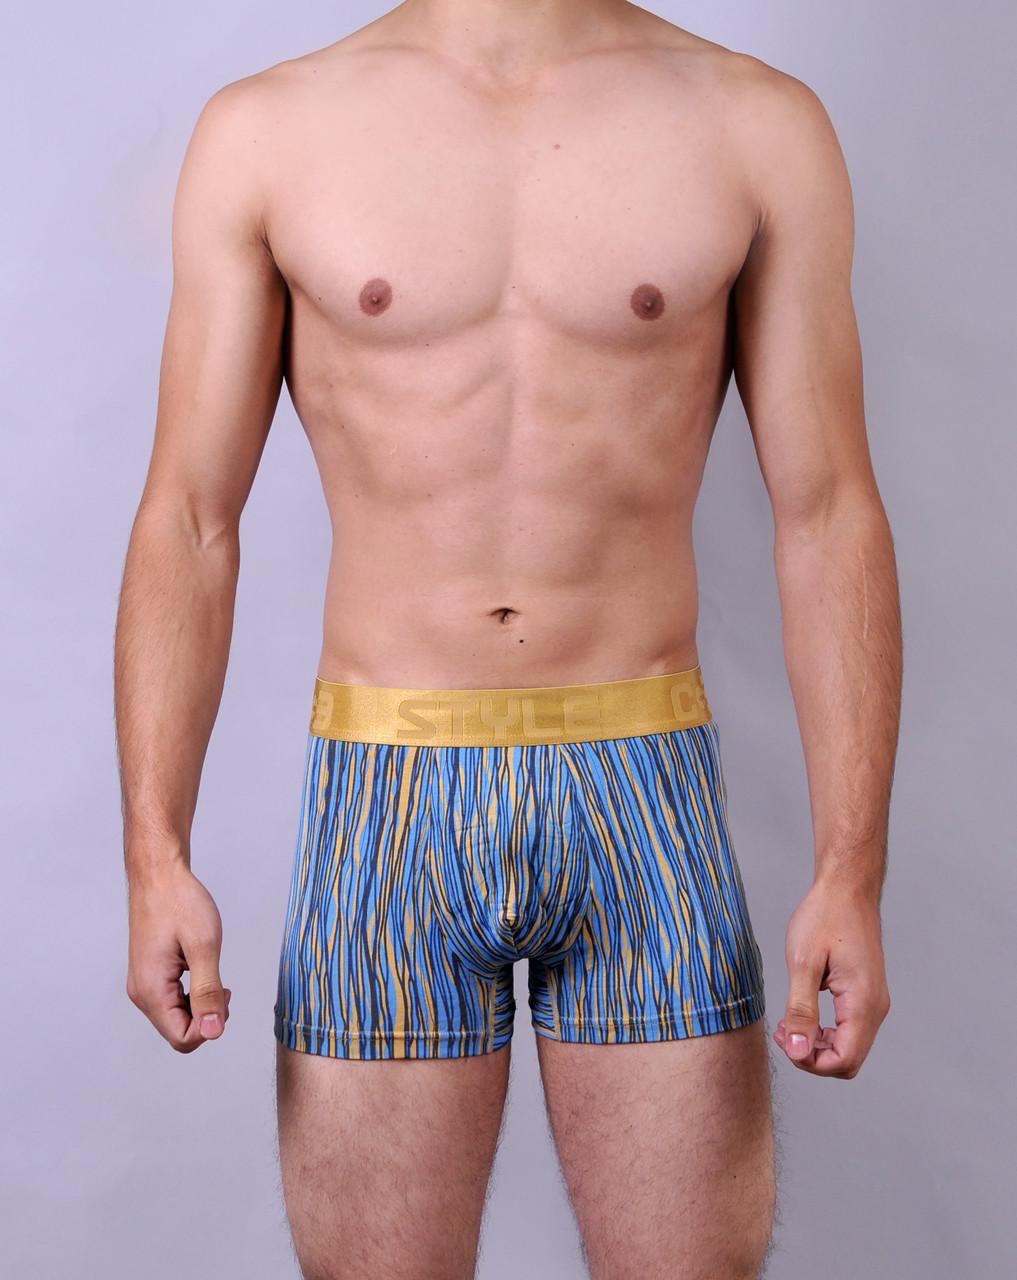 Мужские трусы - боксеры C+3  012  XL  голубые с желтым